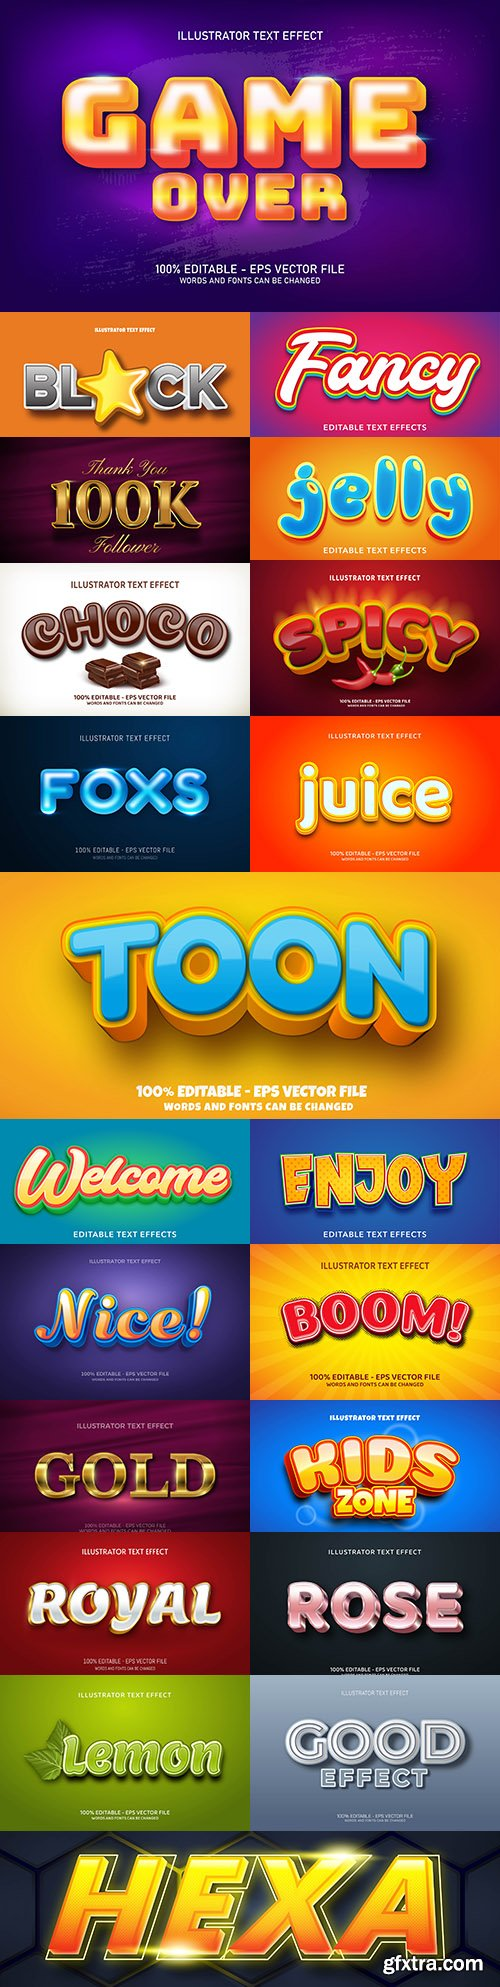 Editable font effect text collection illustration design 237